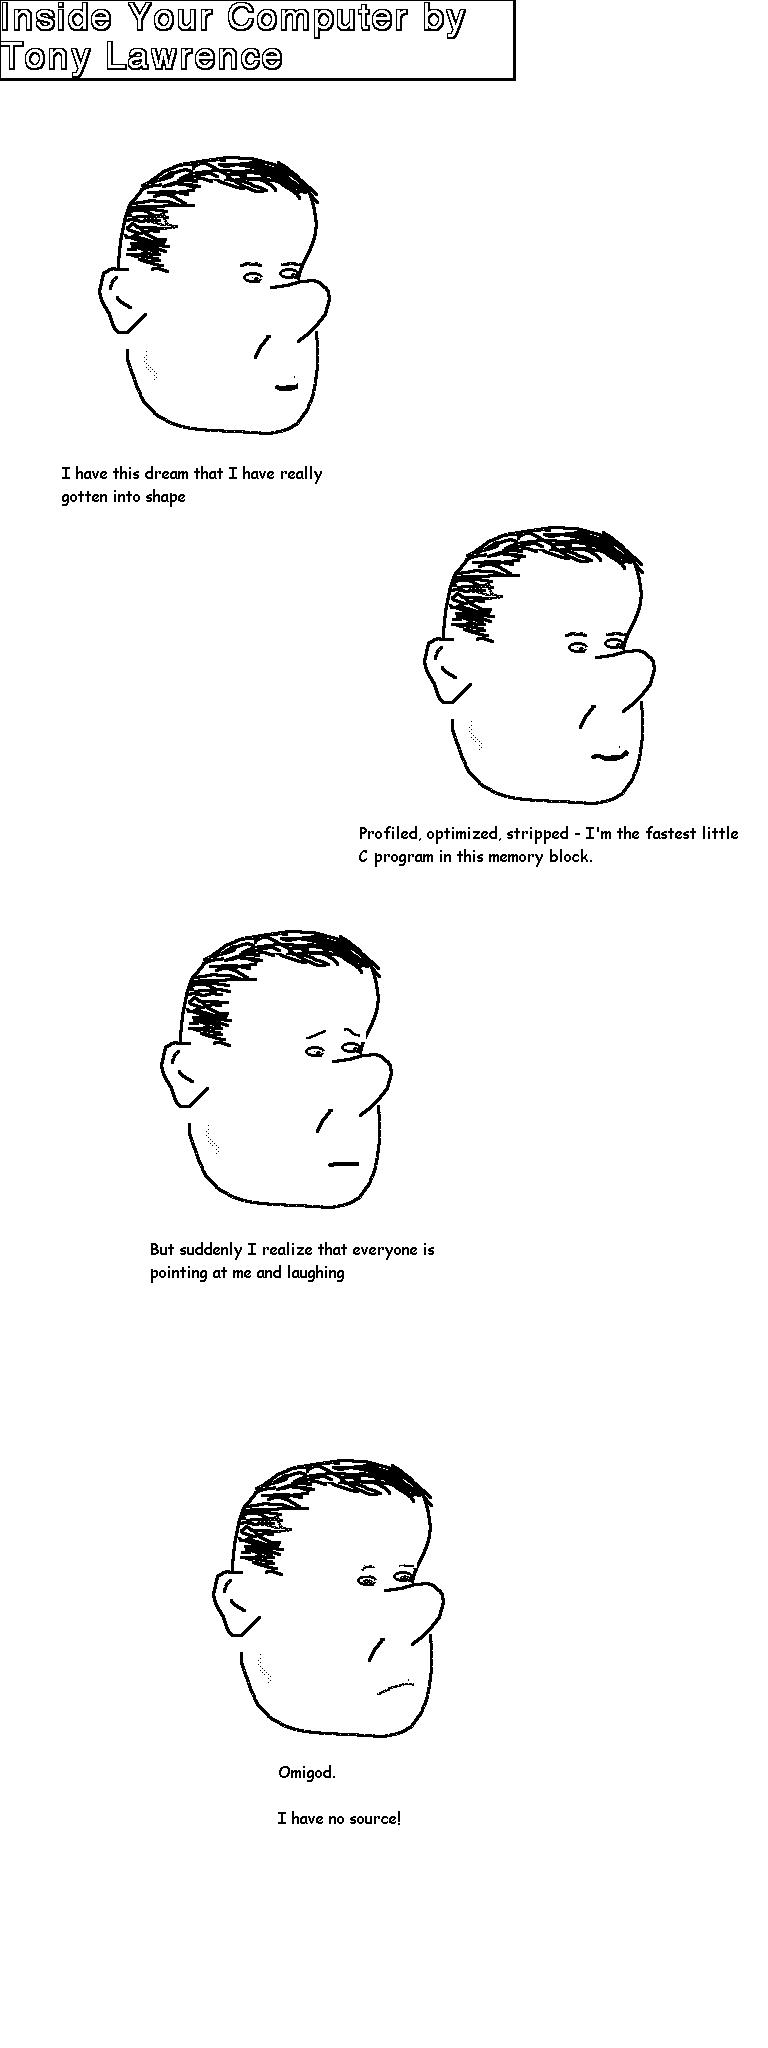 Cartoons: Bad Dreams